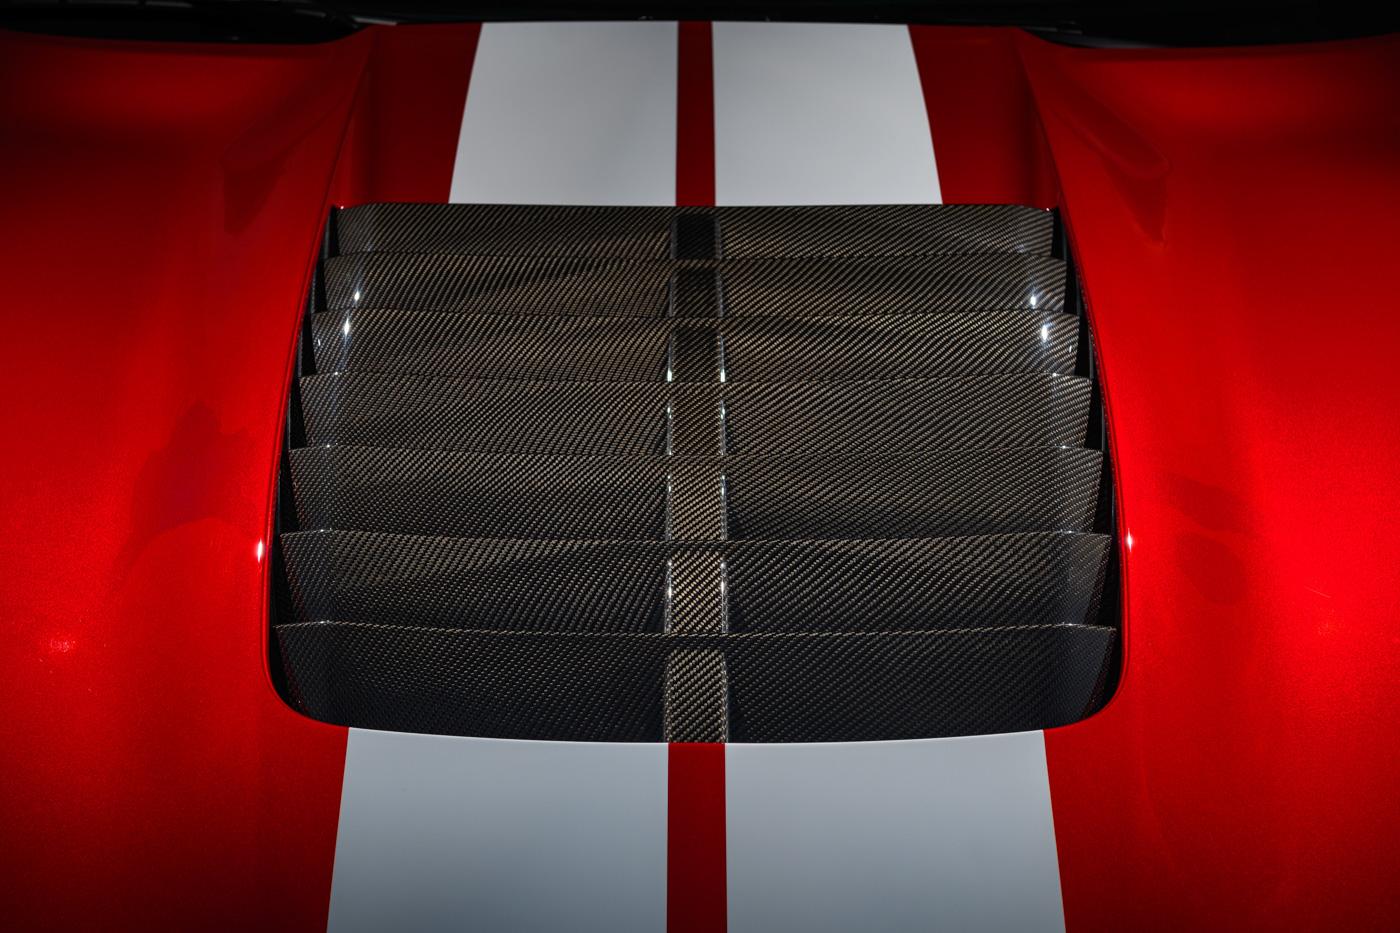 Mustang_GT_500_Carbon_Fiber_Hood_Vent_01.jpg